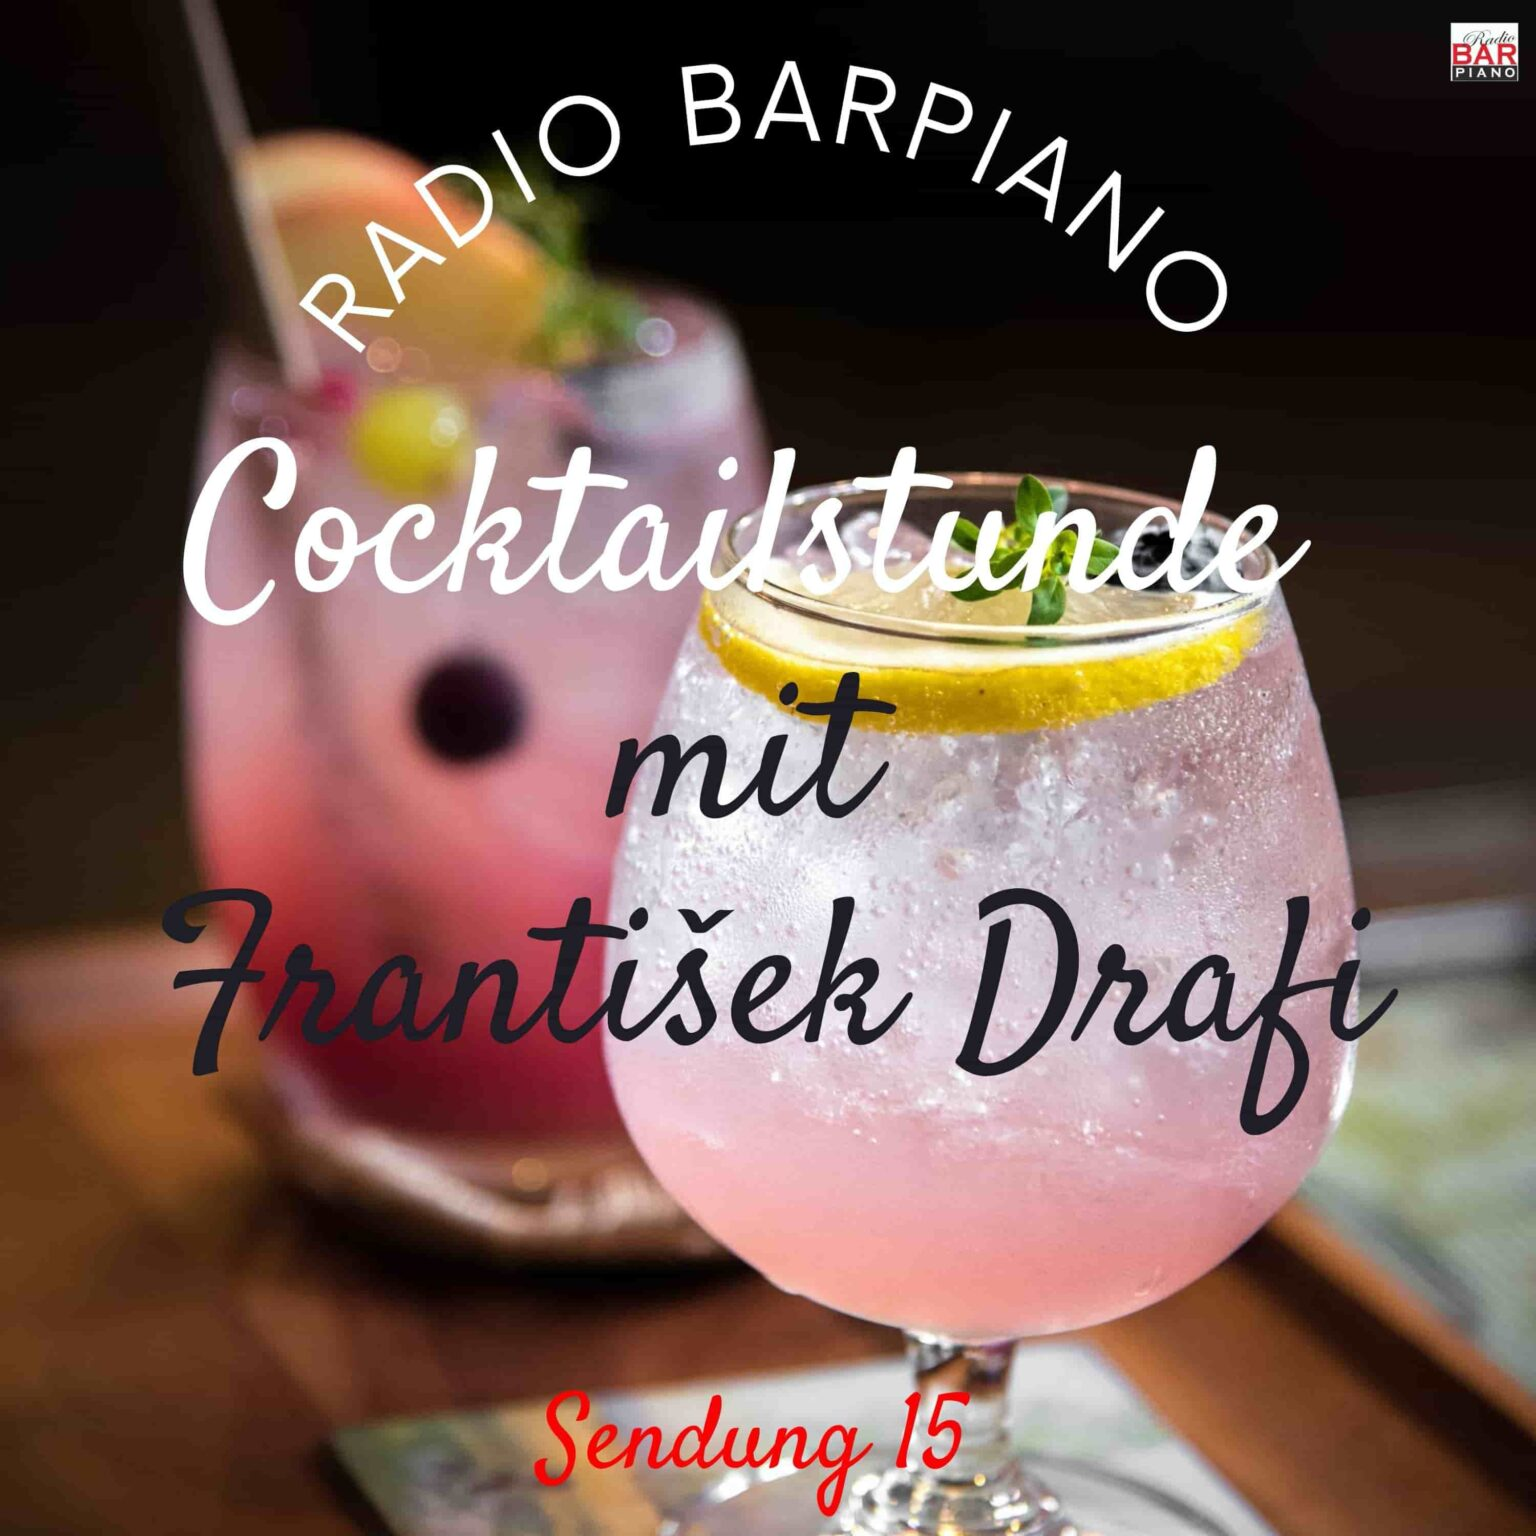 Frantisek Drafi zu Gast bei Alexandra Barnets Cocktail Stunde